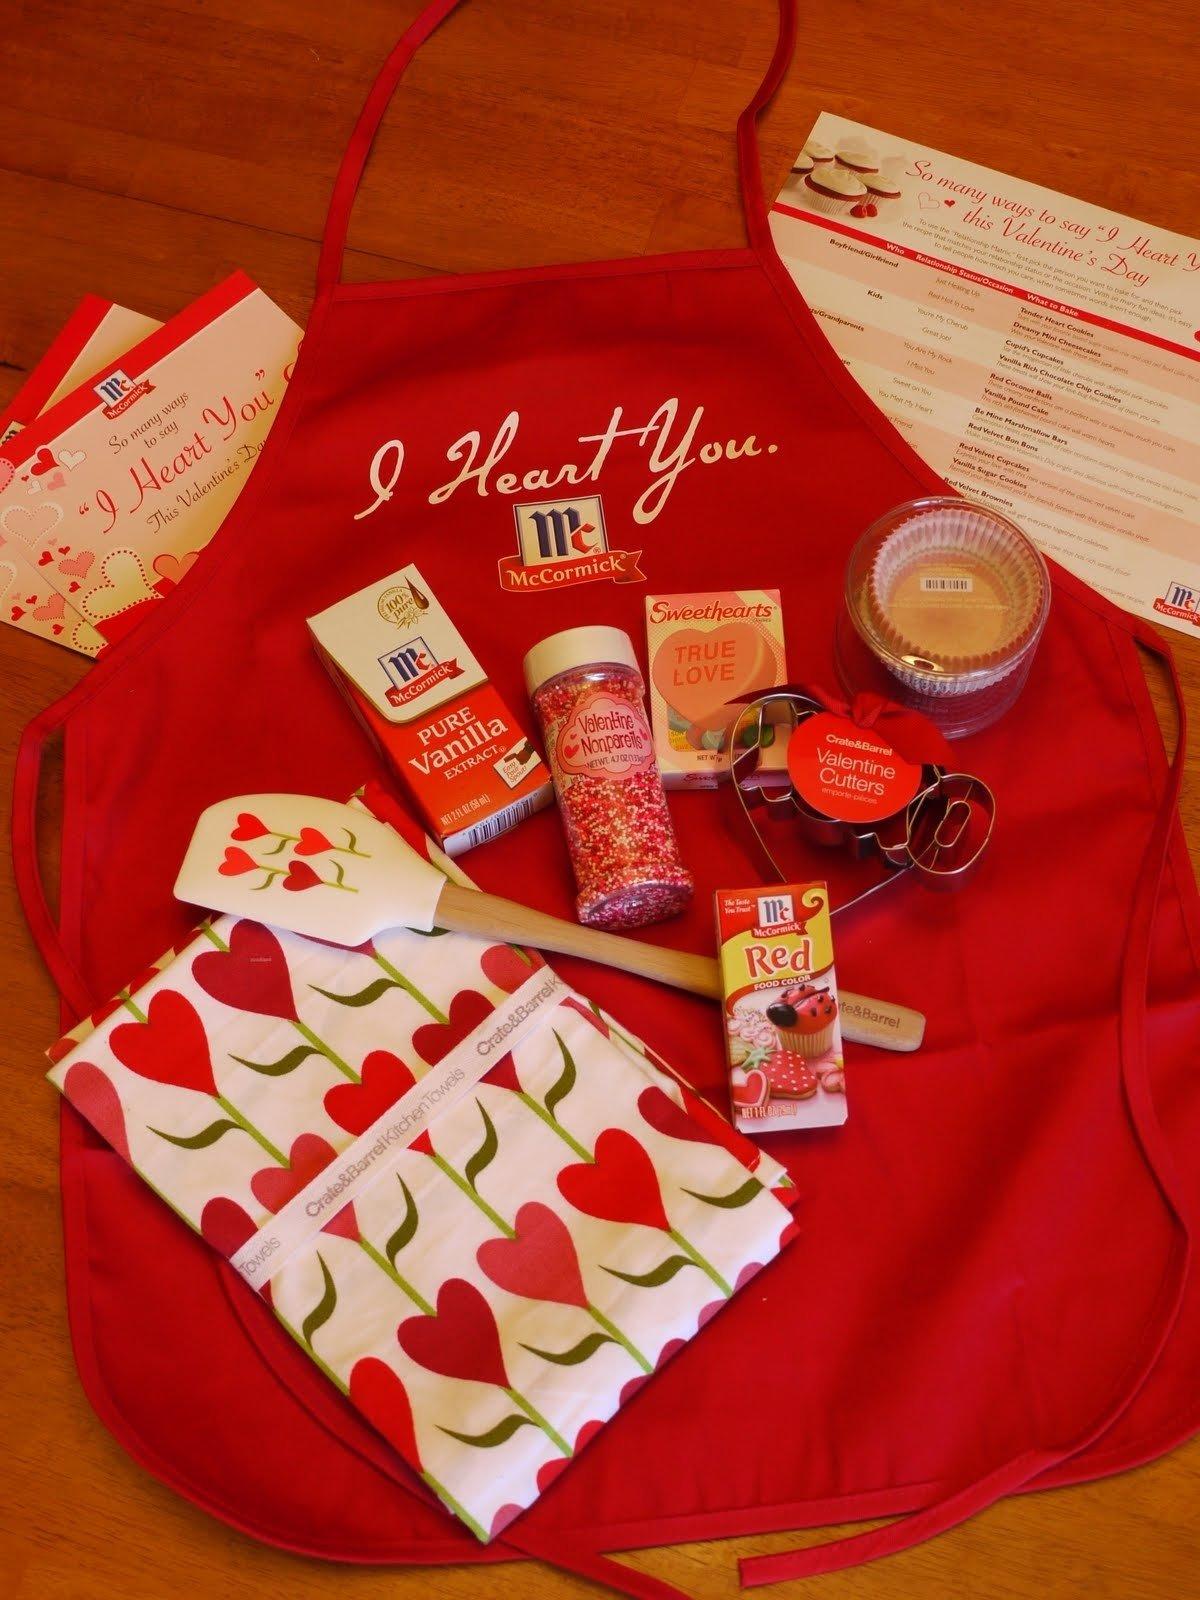 10 Fashionable Ideas For Boyfriend For Valentines Day gift ideas for boyfriend gift ideas for boyfriend for valentines 1 2021